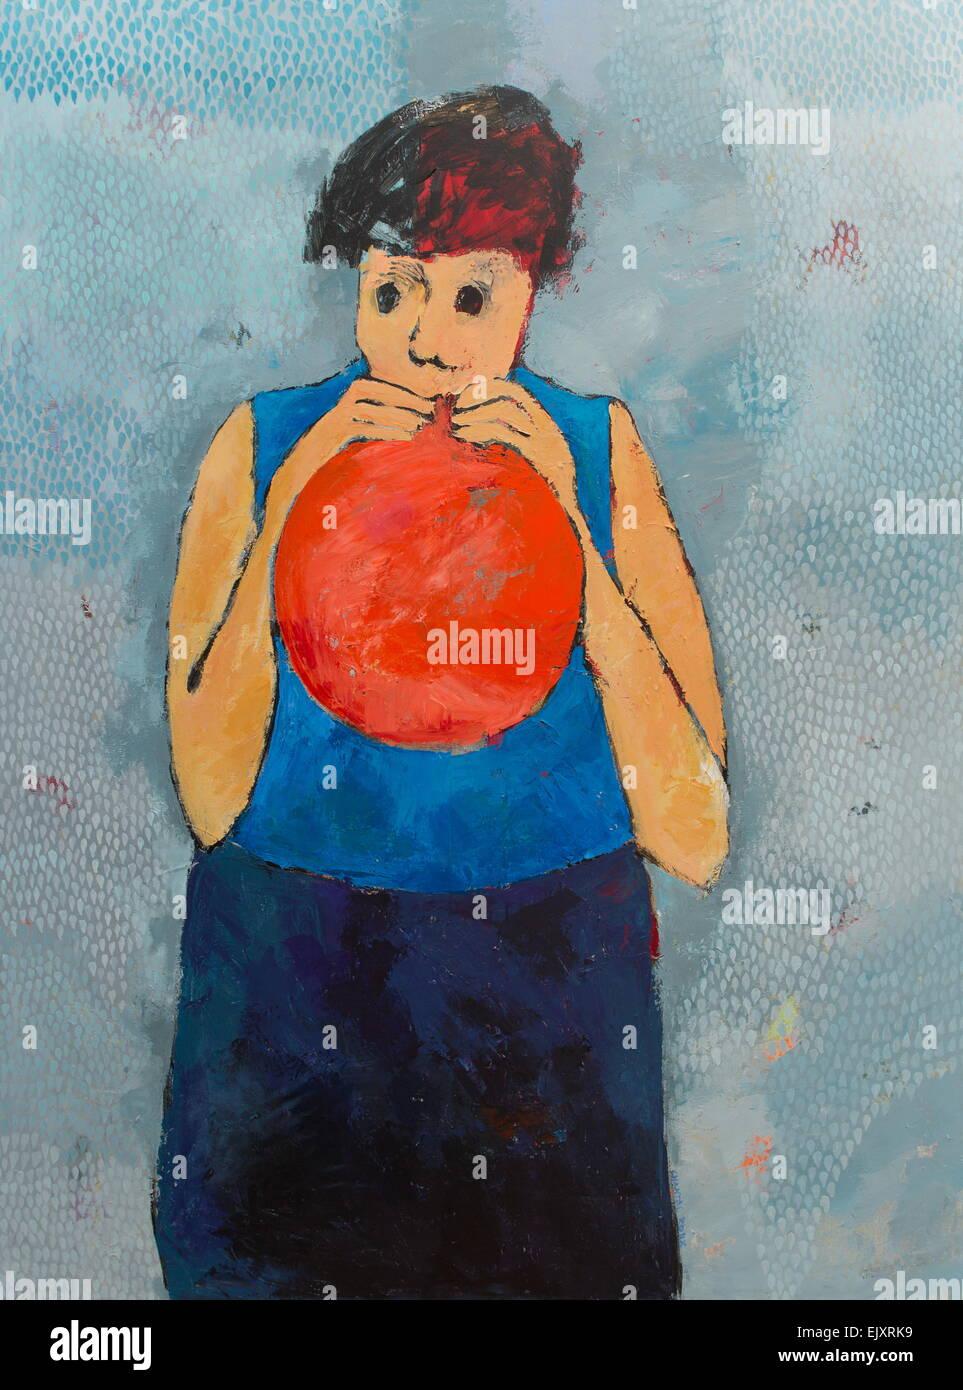 ActiveMuseum_0004635.jpg / The Red Balloon 26.06.2014 - verkauft / 21. Jahrhundert Chantal Roux / aktive Museum Stockbild